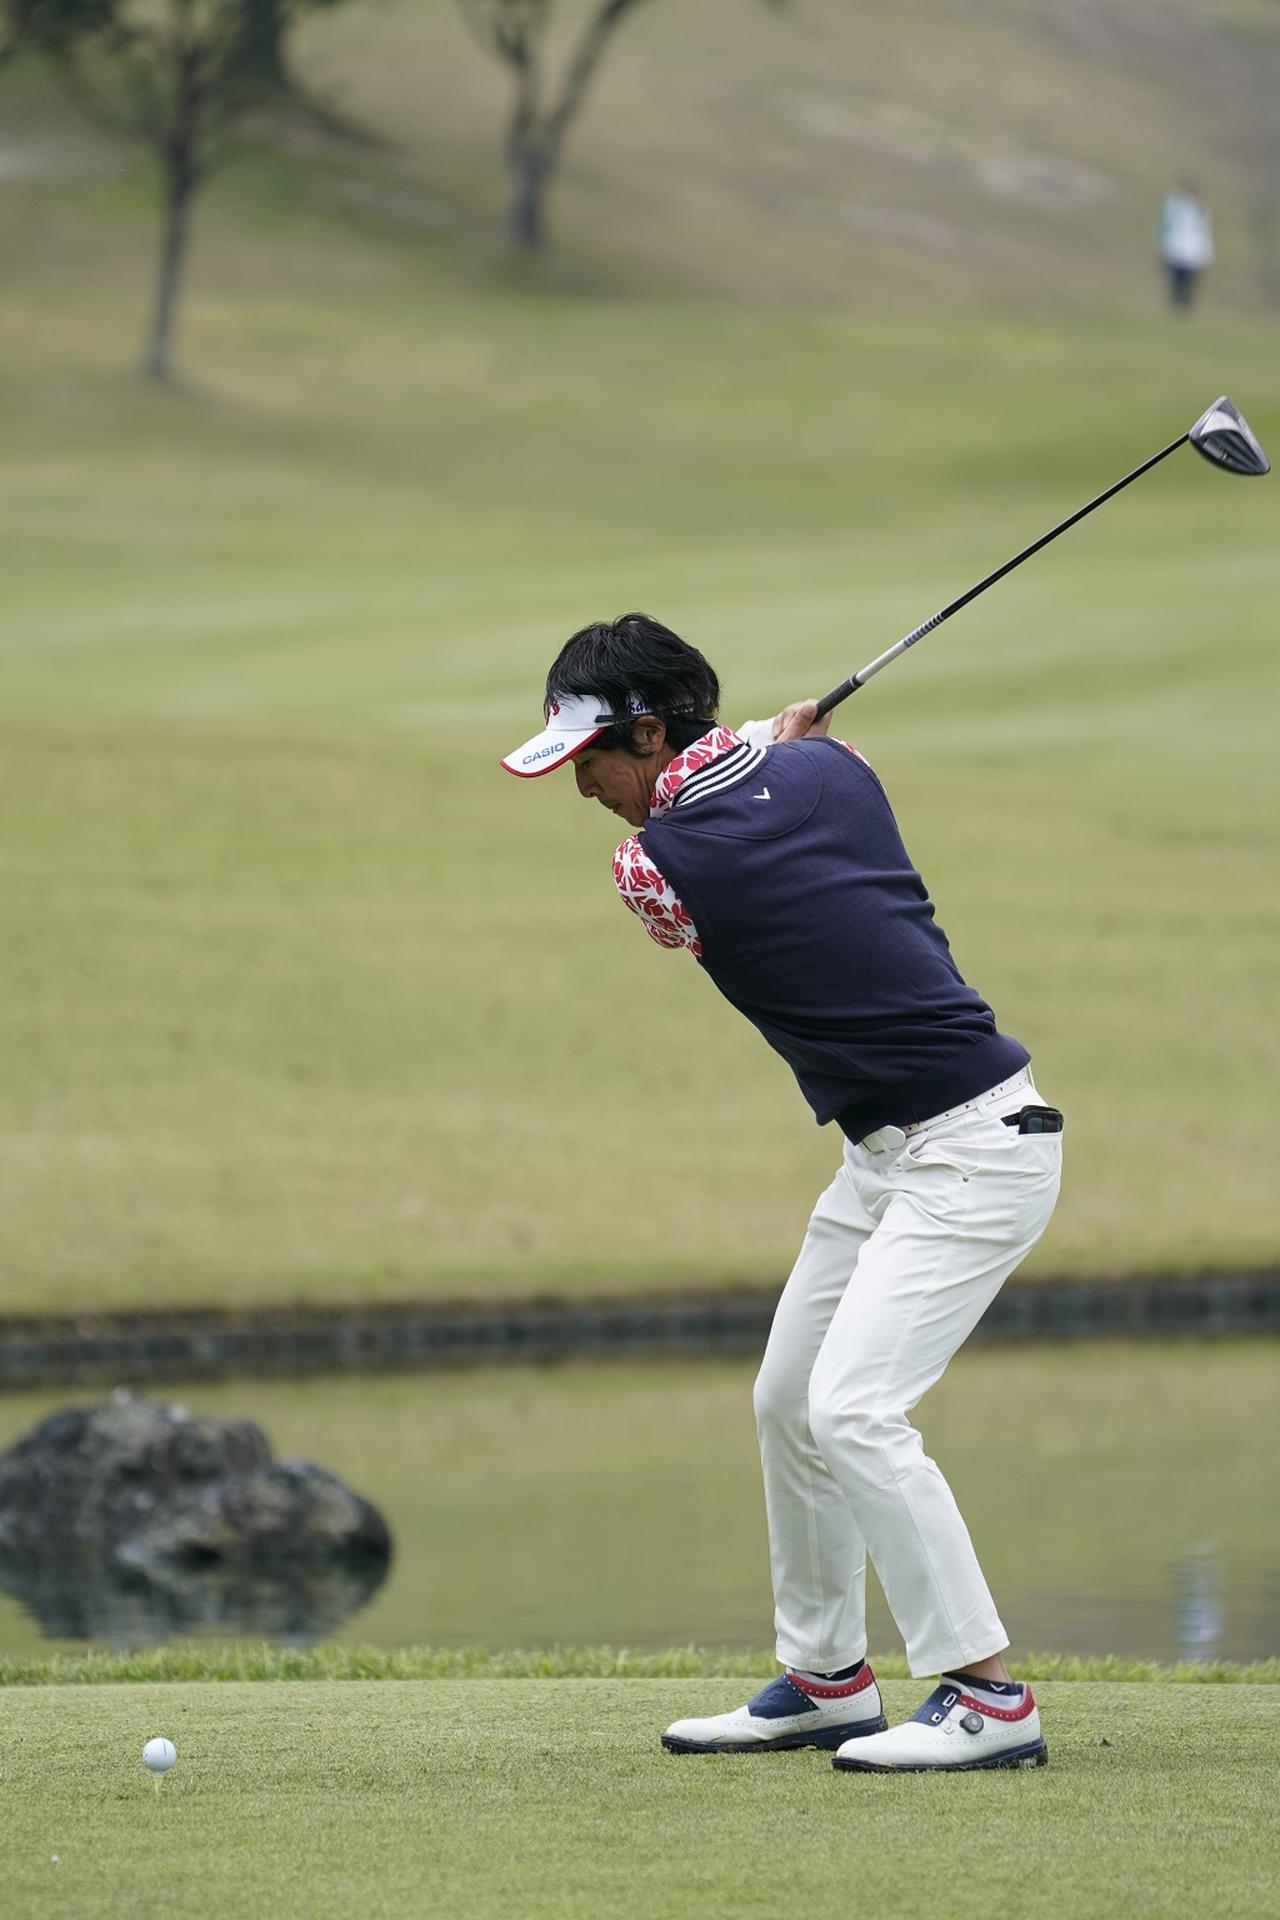 Images : 8番目の画像 - 石川遼ドライバー前方連続写真 - みんなのゴルフダイジェスト